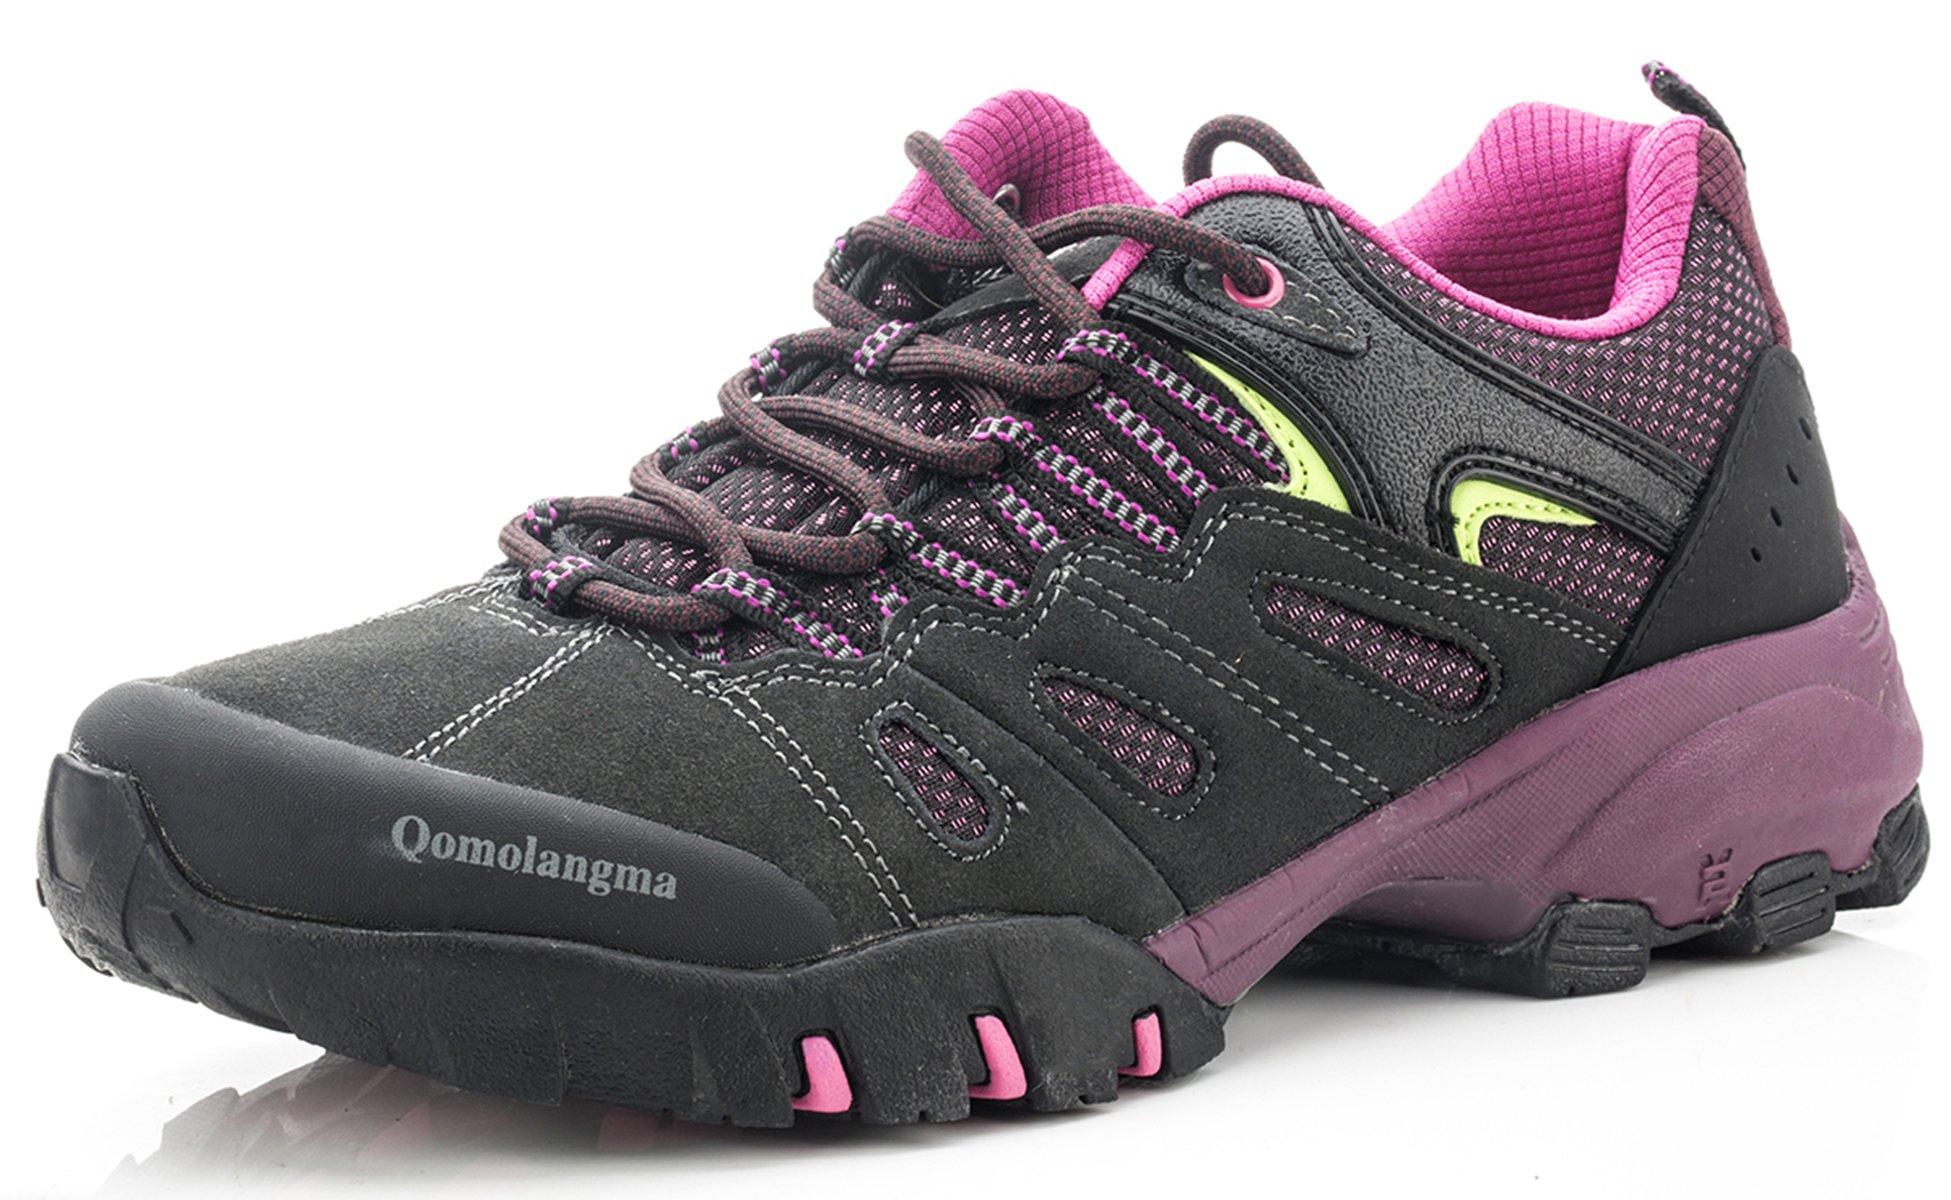 QOMOLANGMA Women's Hiking Shoes Skid-proof Walking Sneaker for Running Trekking Outdoor Training, Grey/Purple, 8 B(M) US by QOMOLANGMA